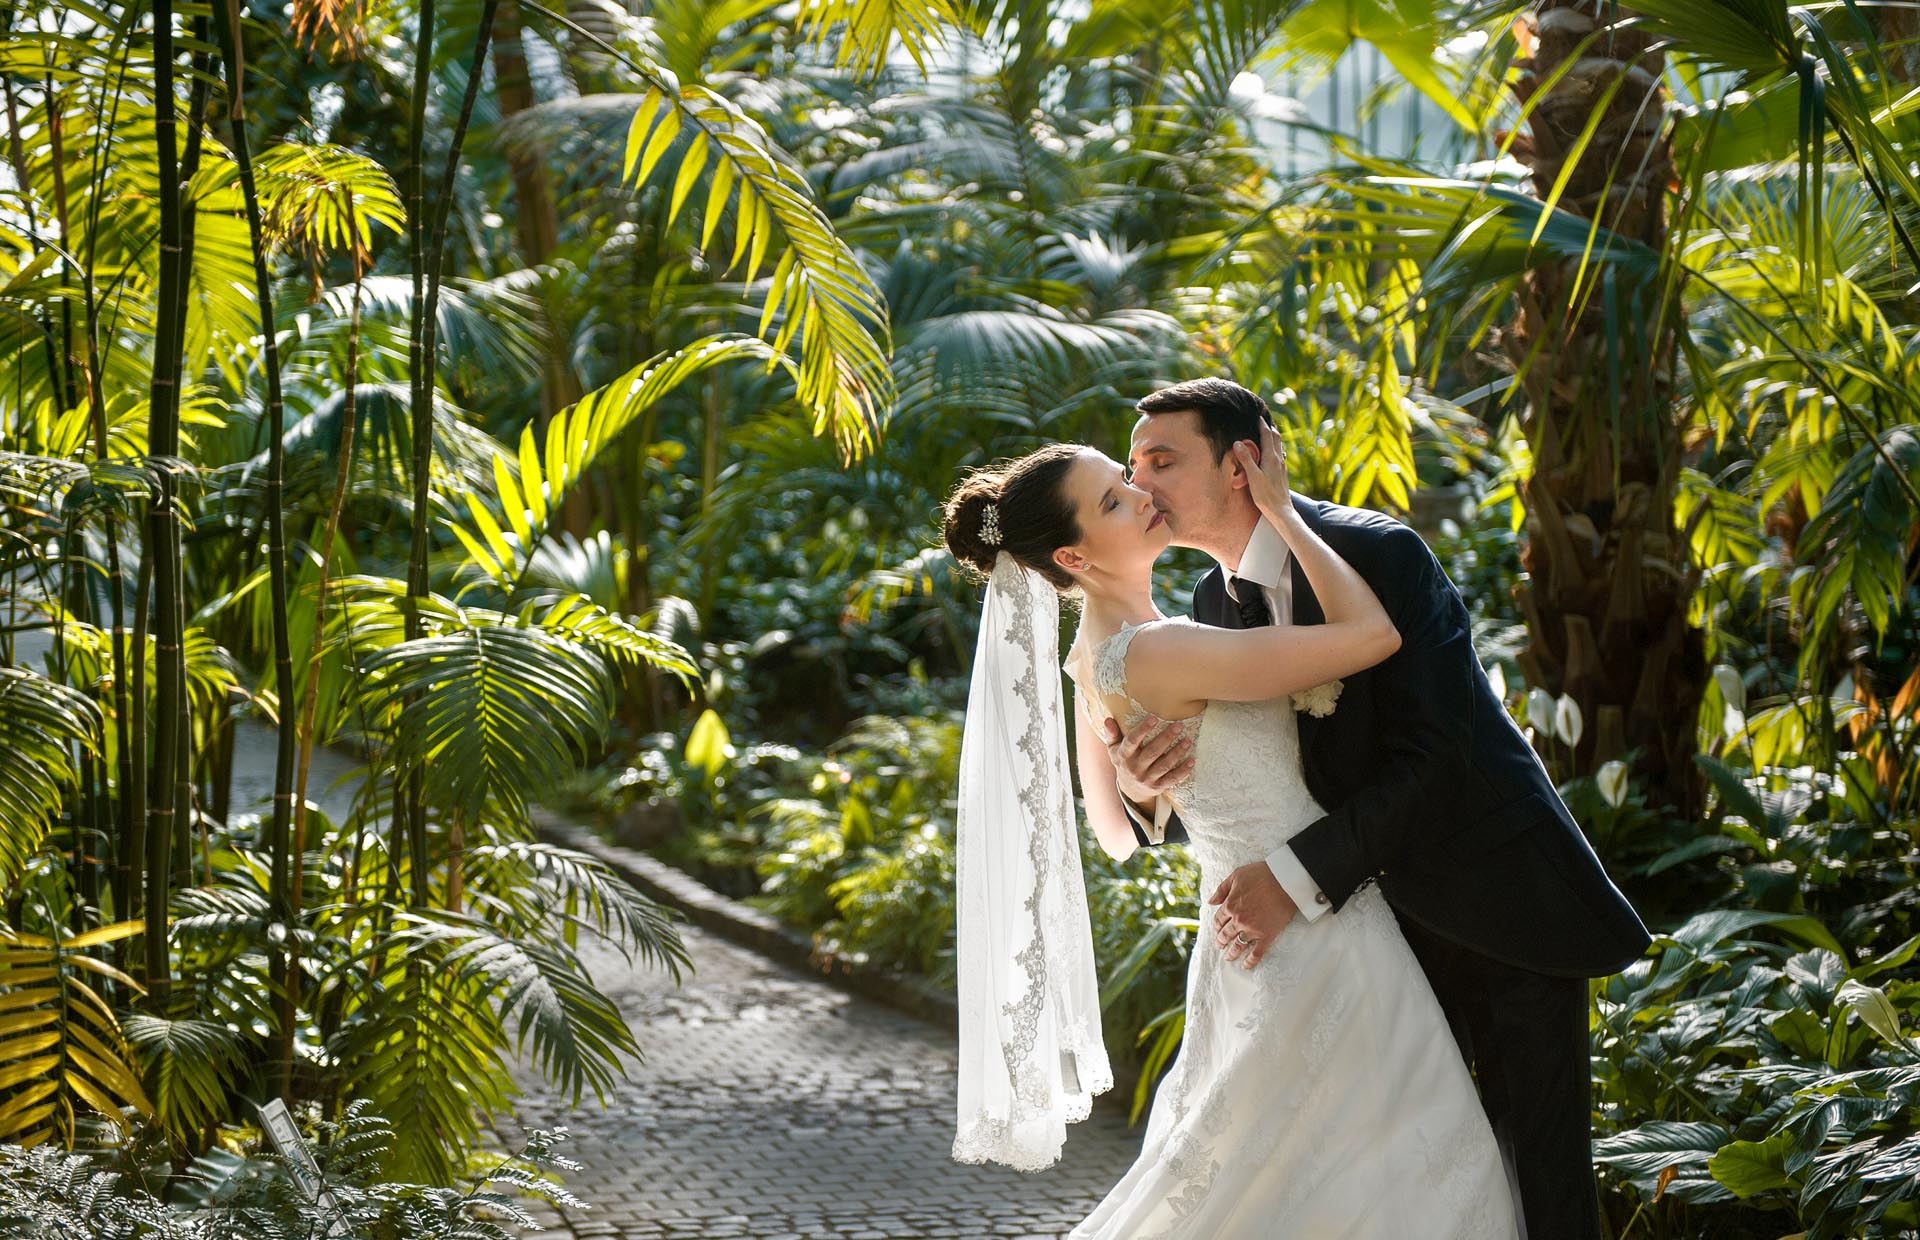 Brautpaarshooting im Palmengarten Frankfurt